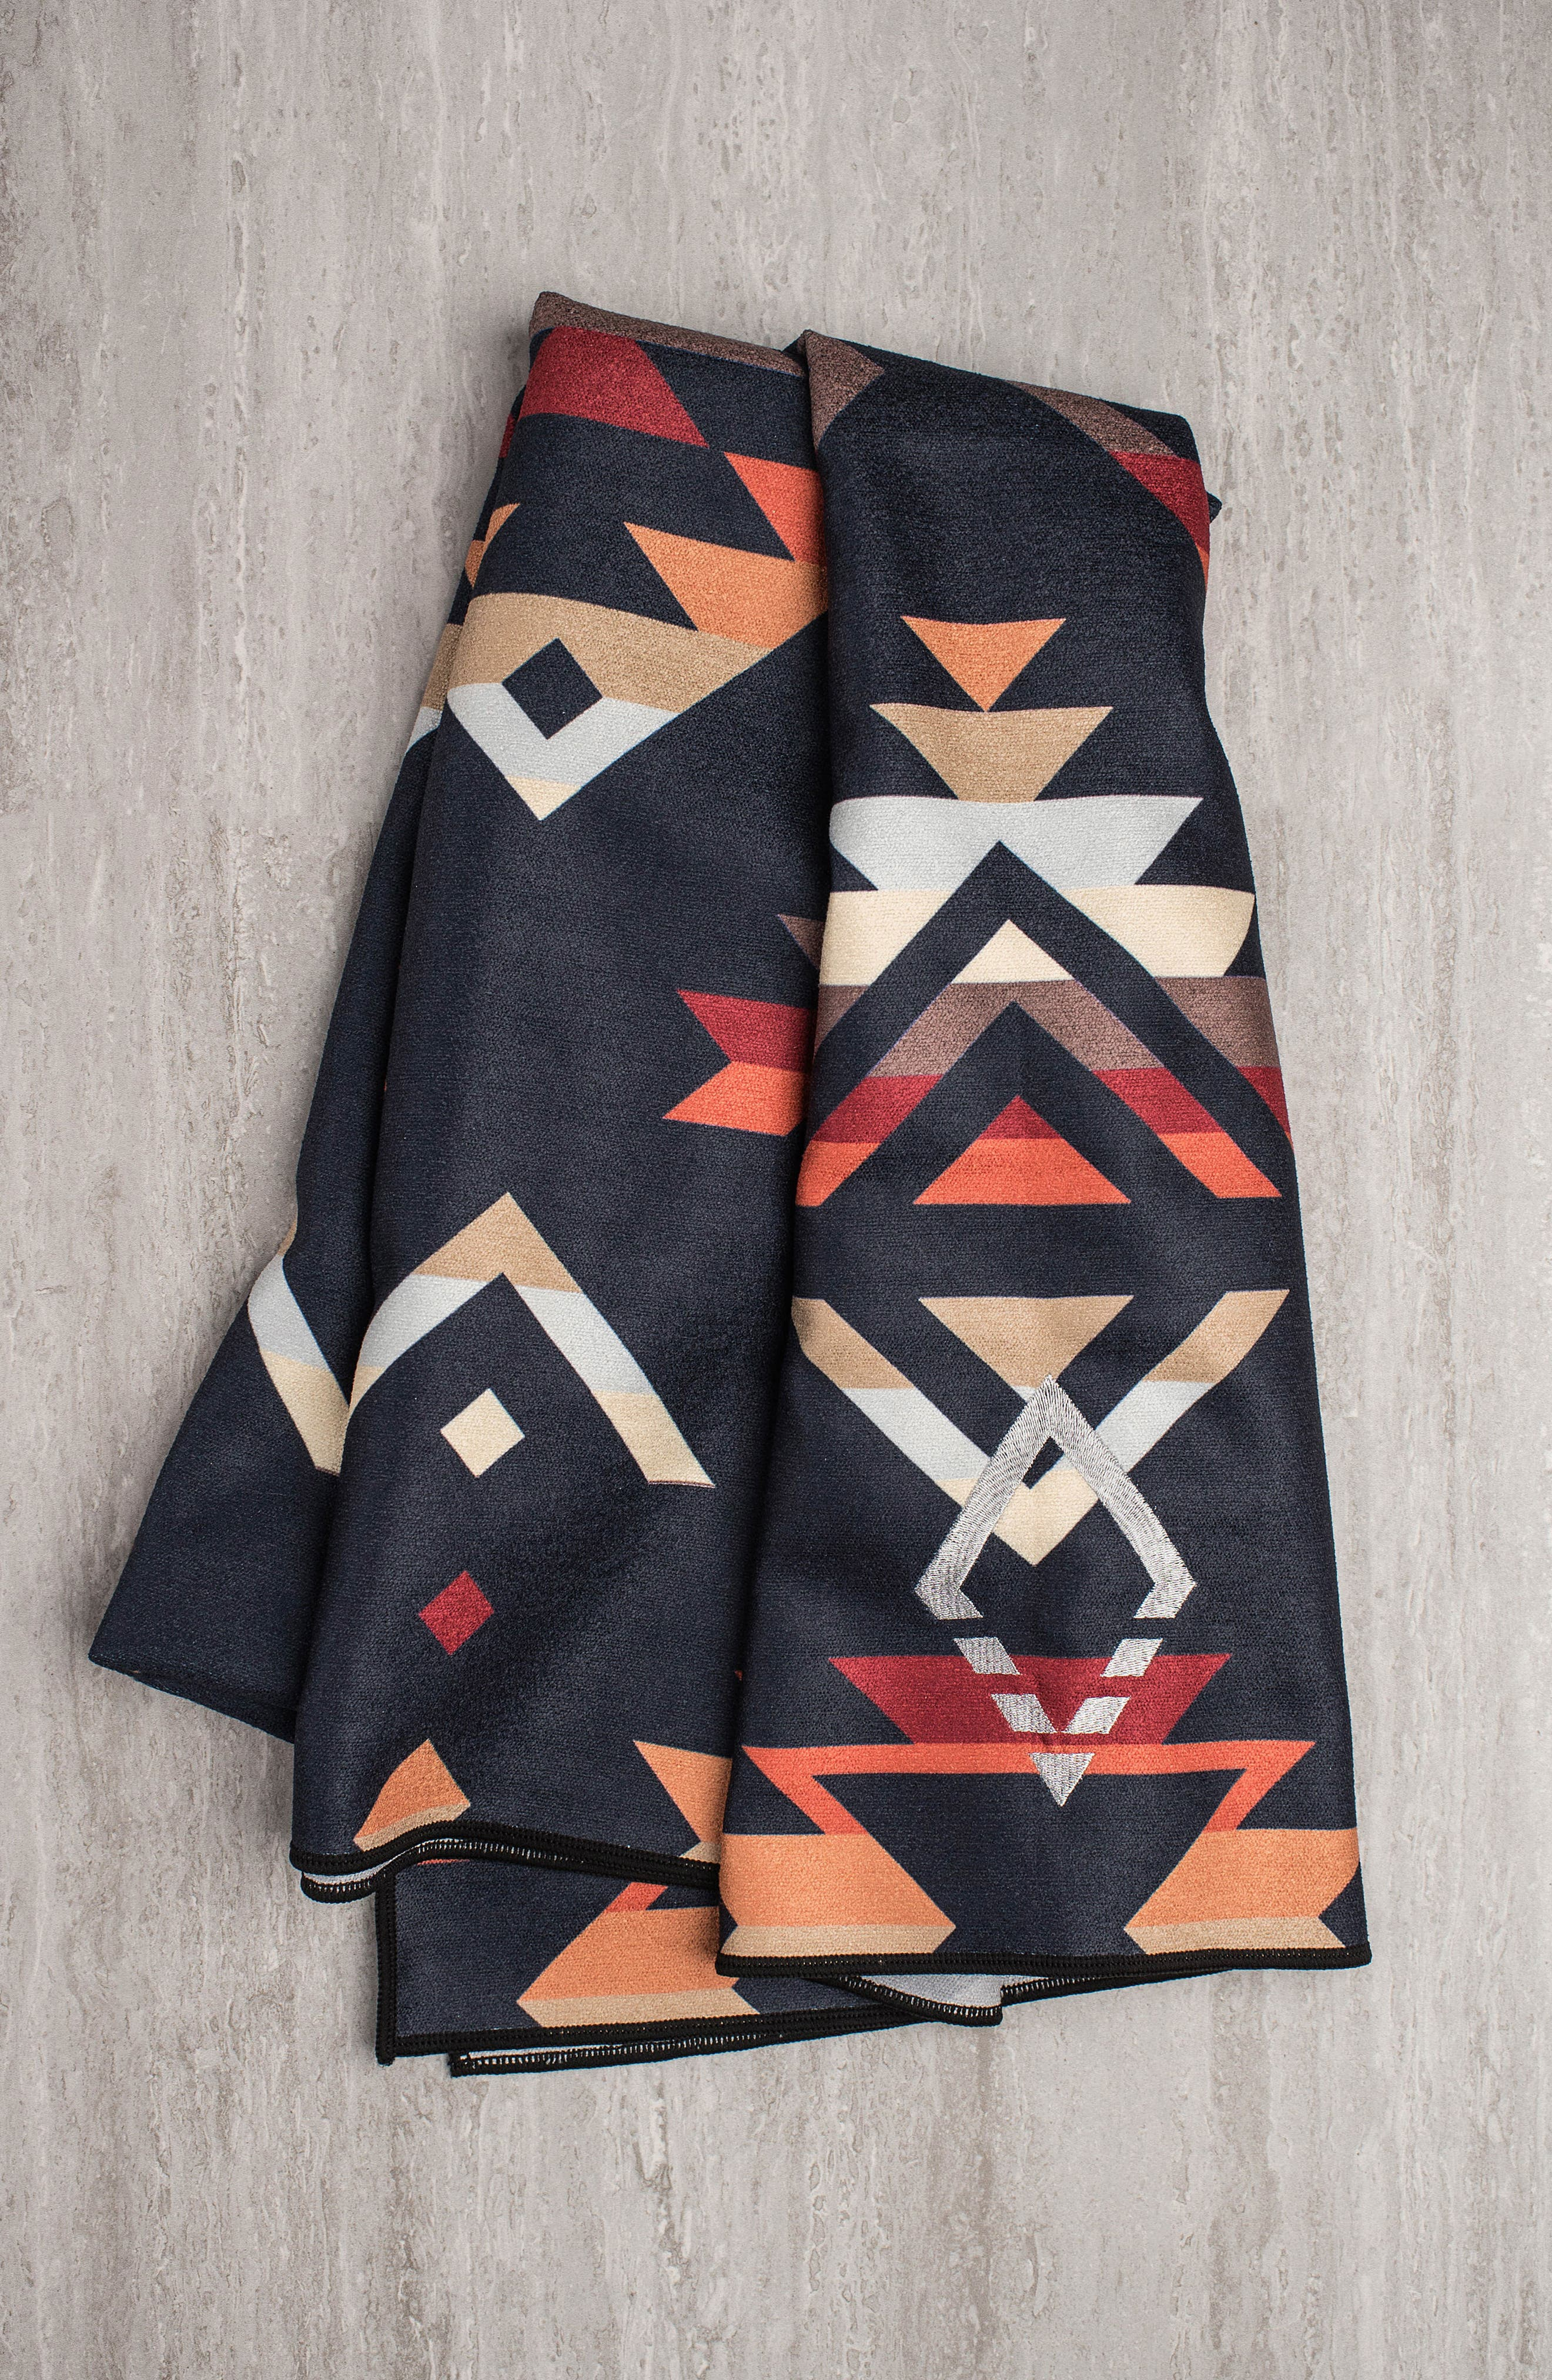 PNW Yoga Towel,                             Alternate thumbnail 2, color,                             400